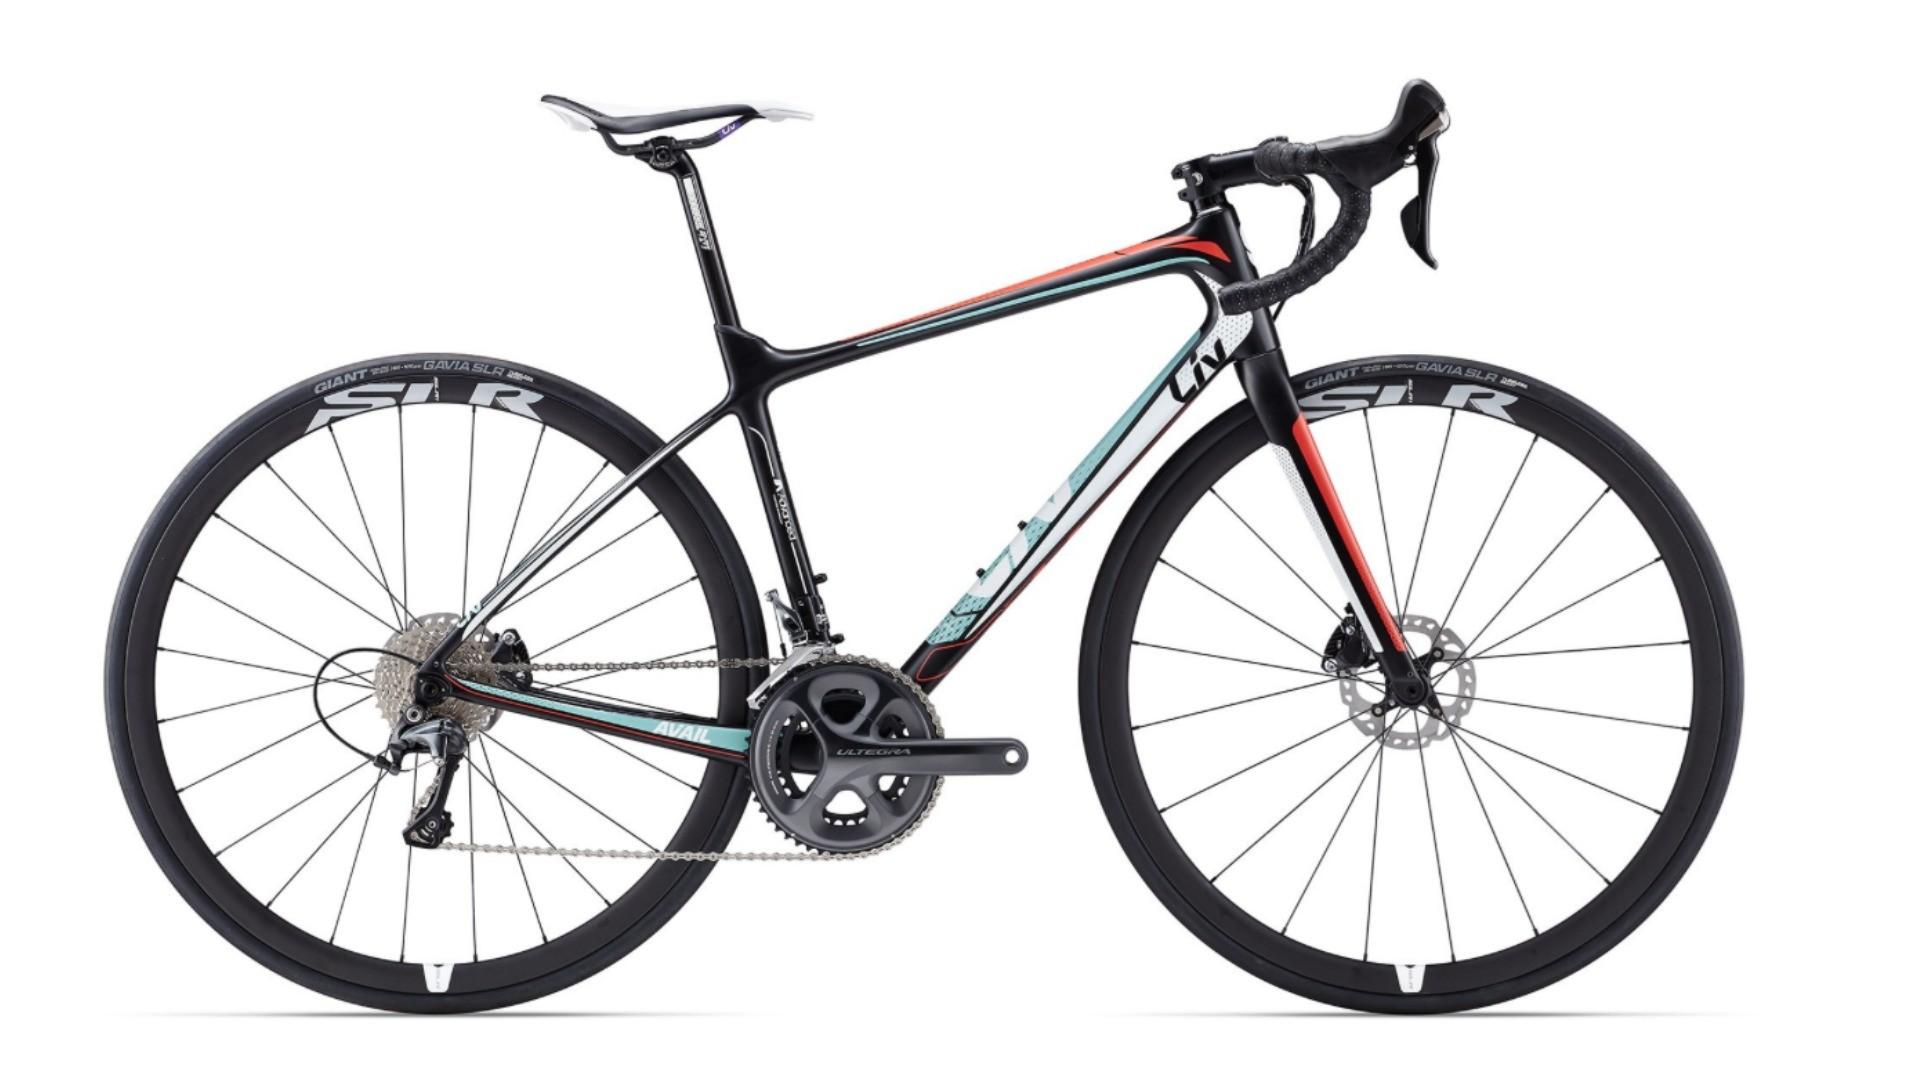 305024d8ad0 Liv Cycling 2017 women's road bike range - BikeRadar